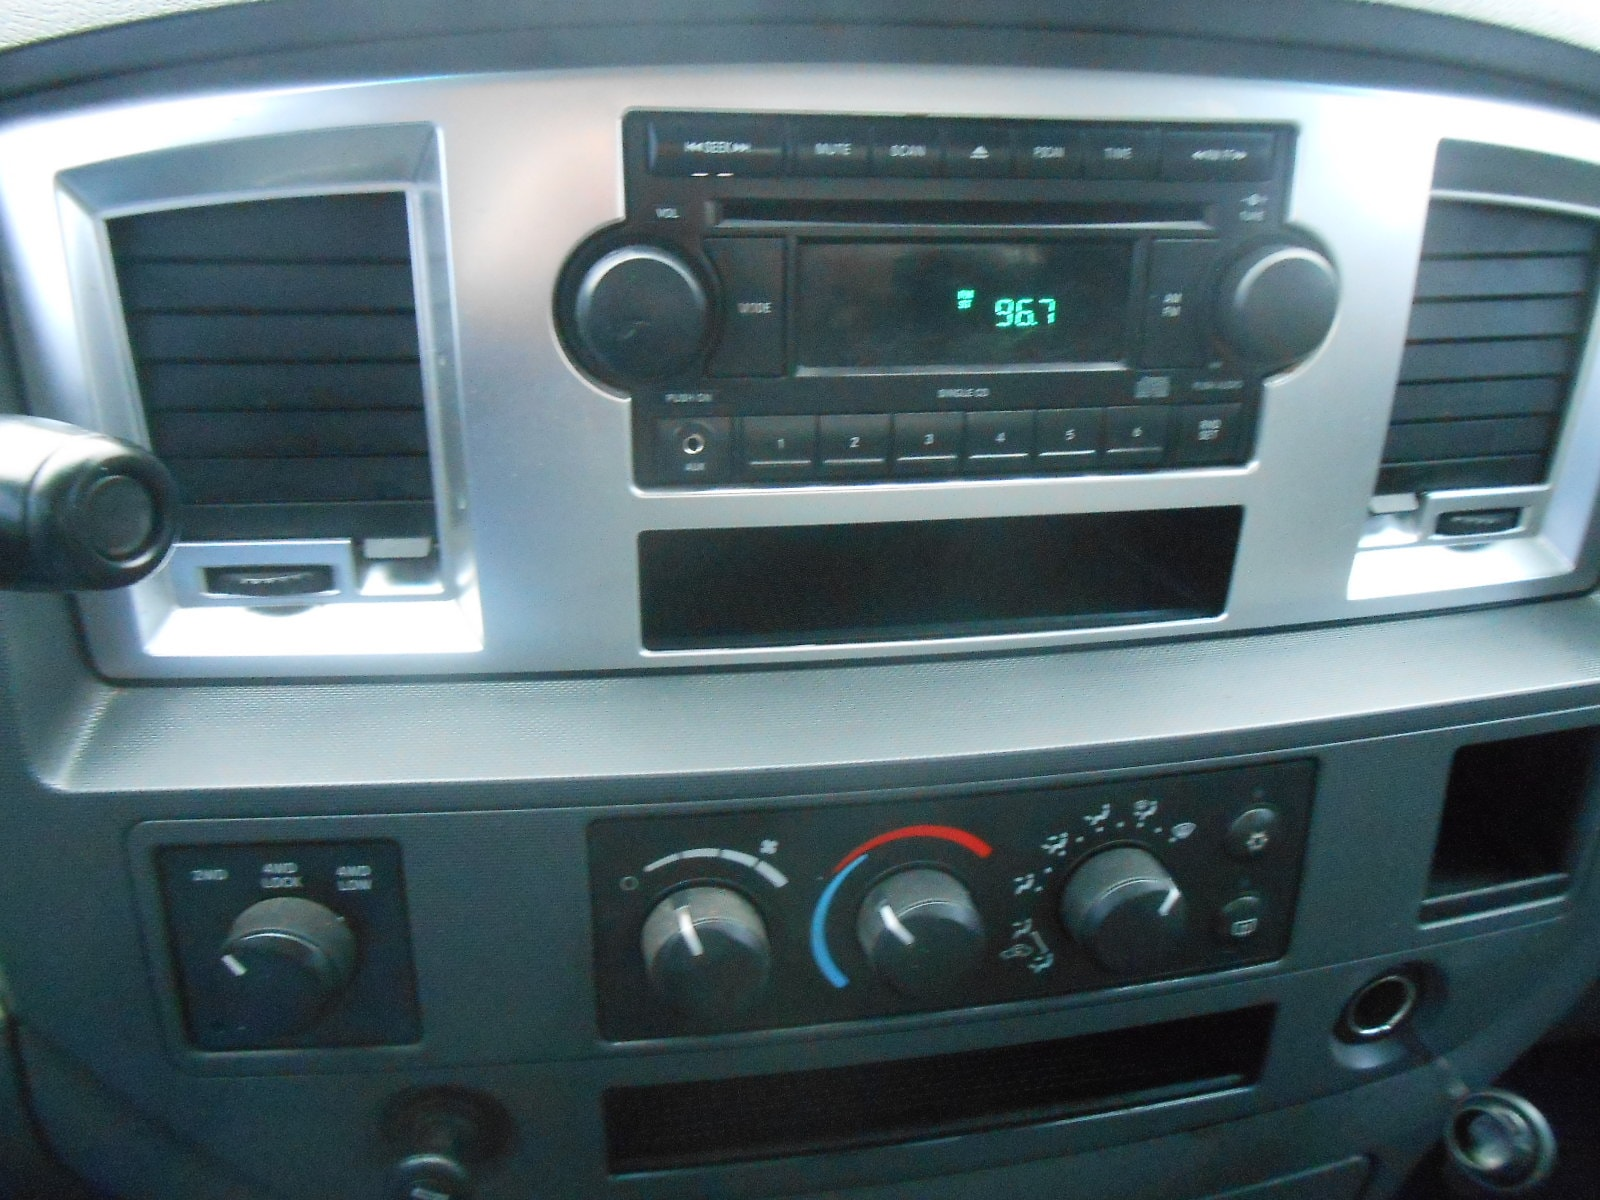 2007 dodge ram radio time set